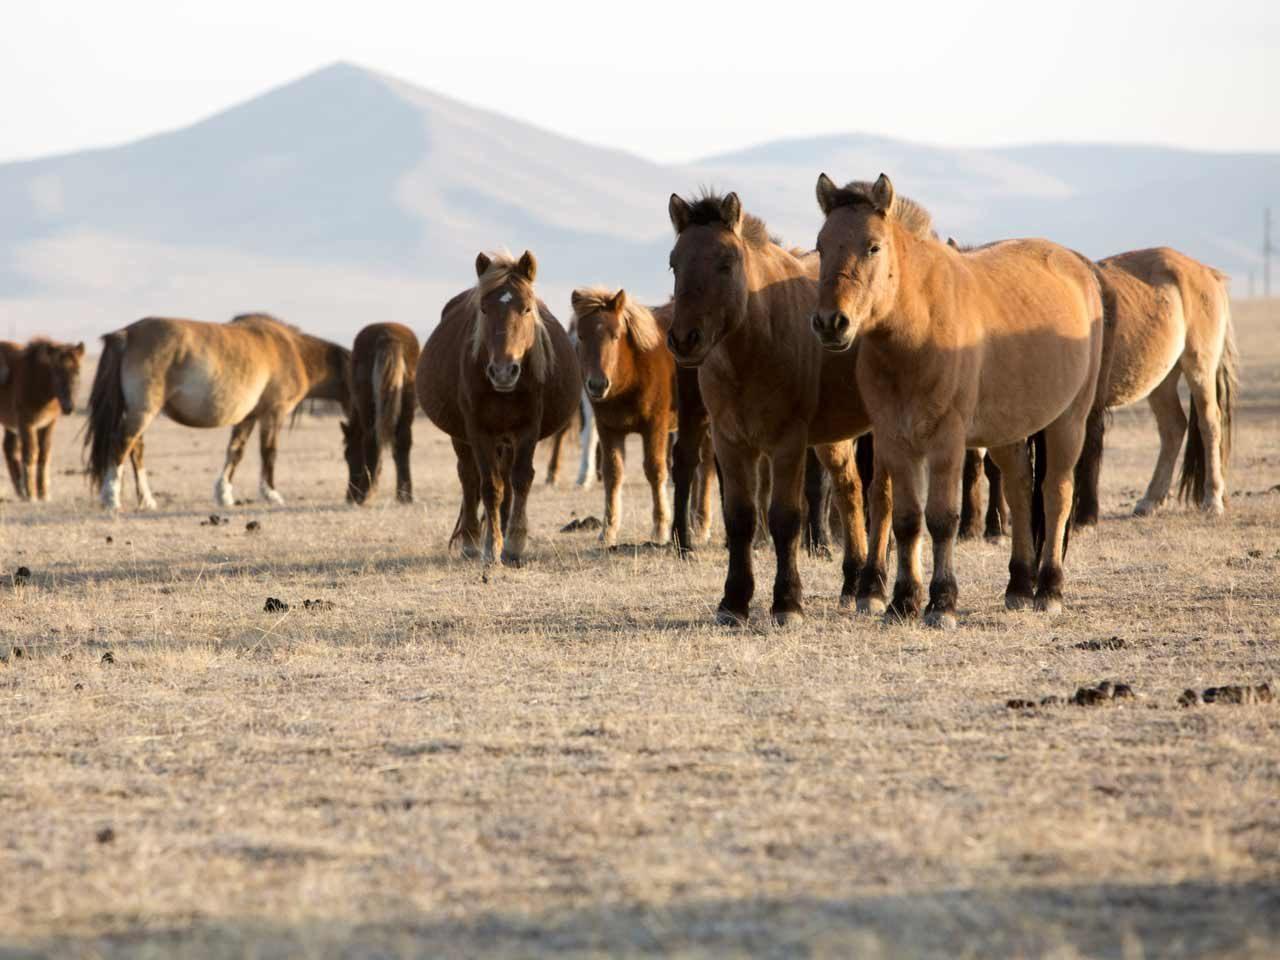 Aduu Mal Mongolie cuir équidé